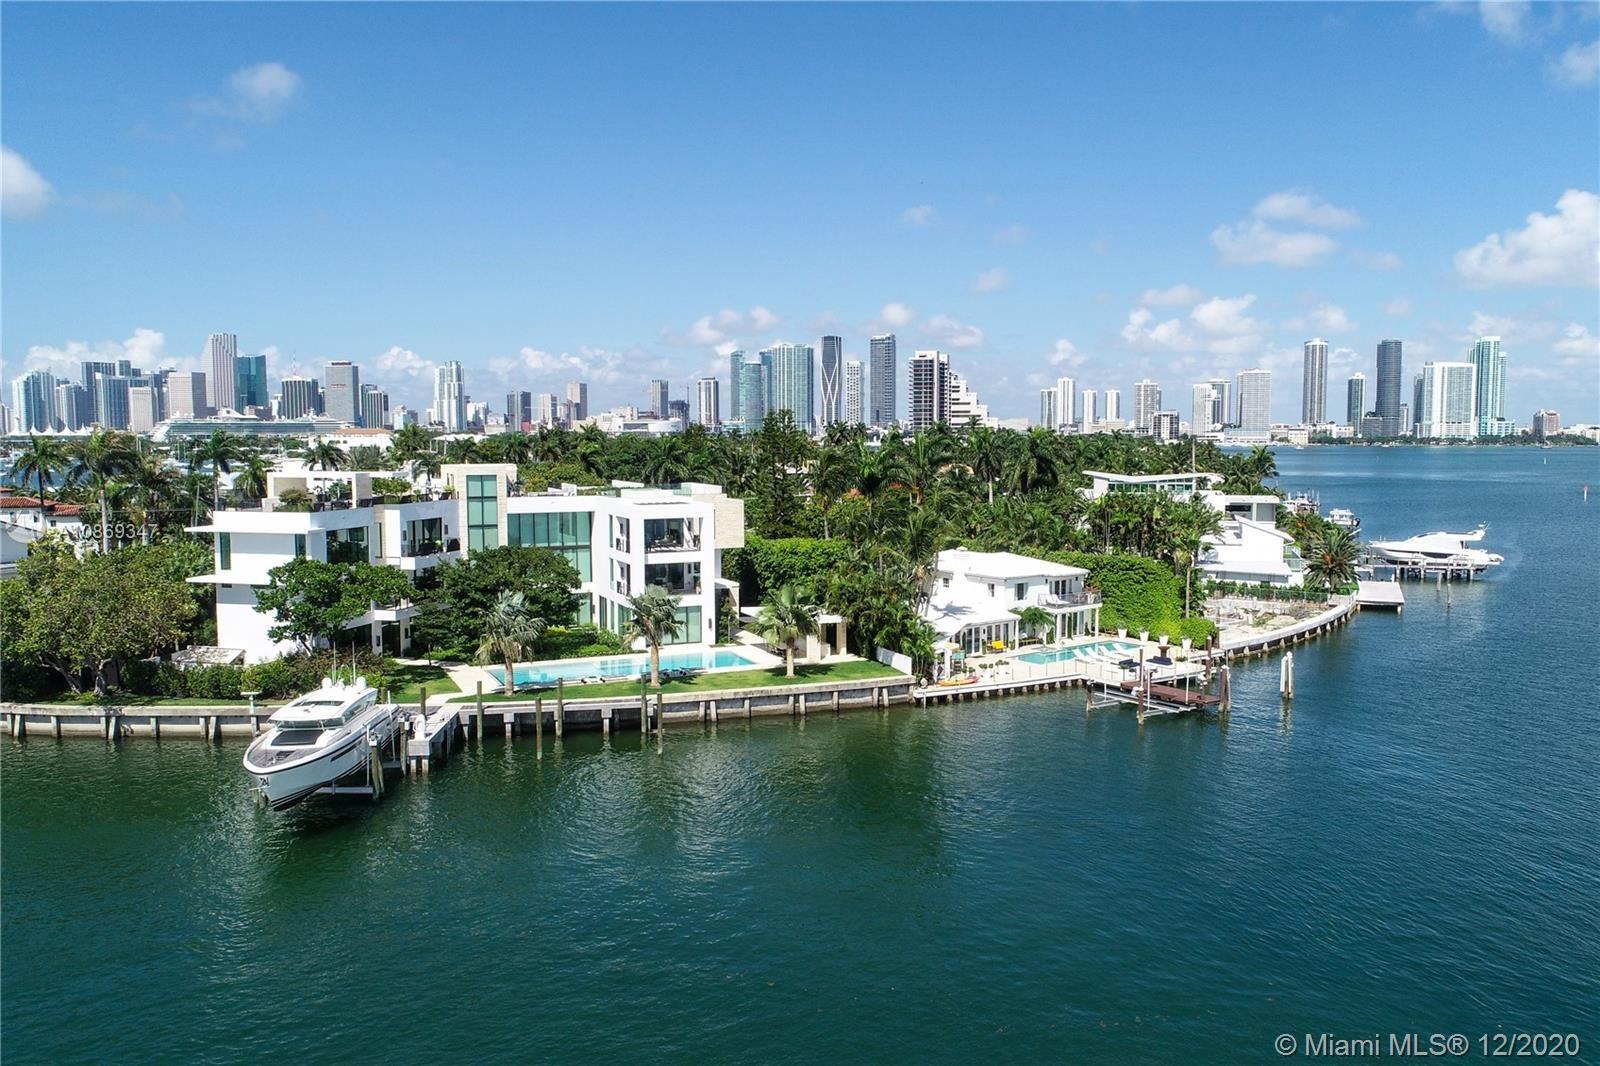 Photo 1 of Listing MLS a10869347 in 1429 N Venetian Way Miami FL 33139